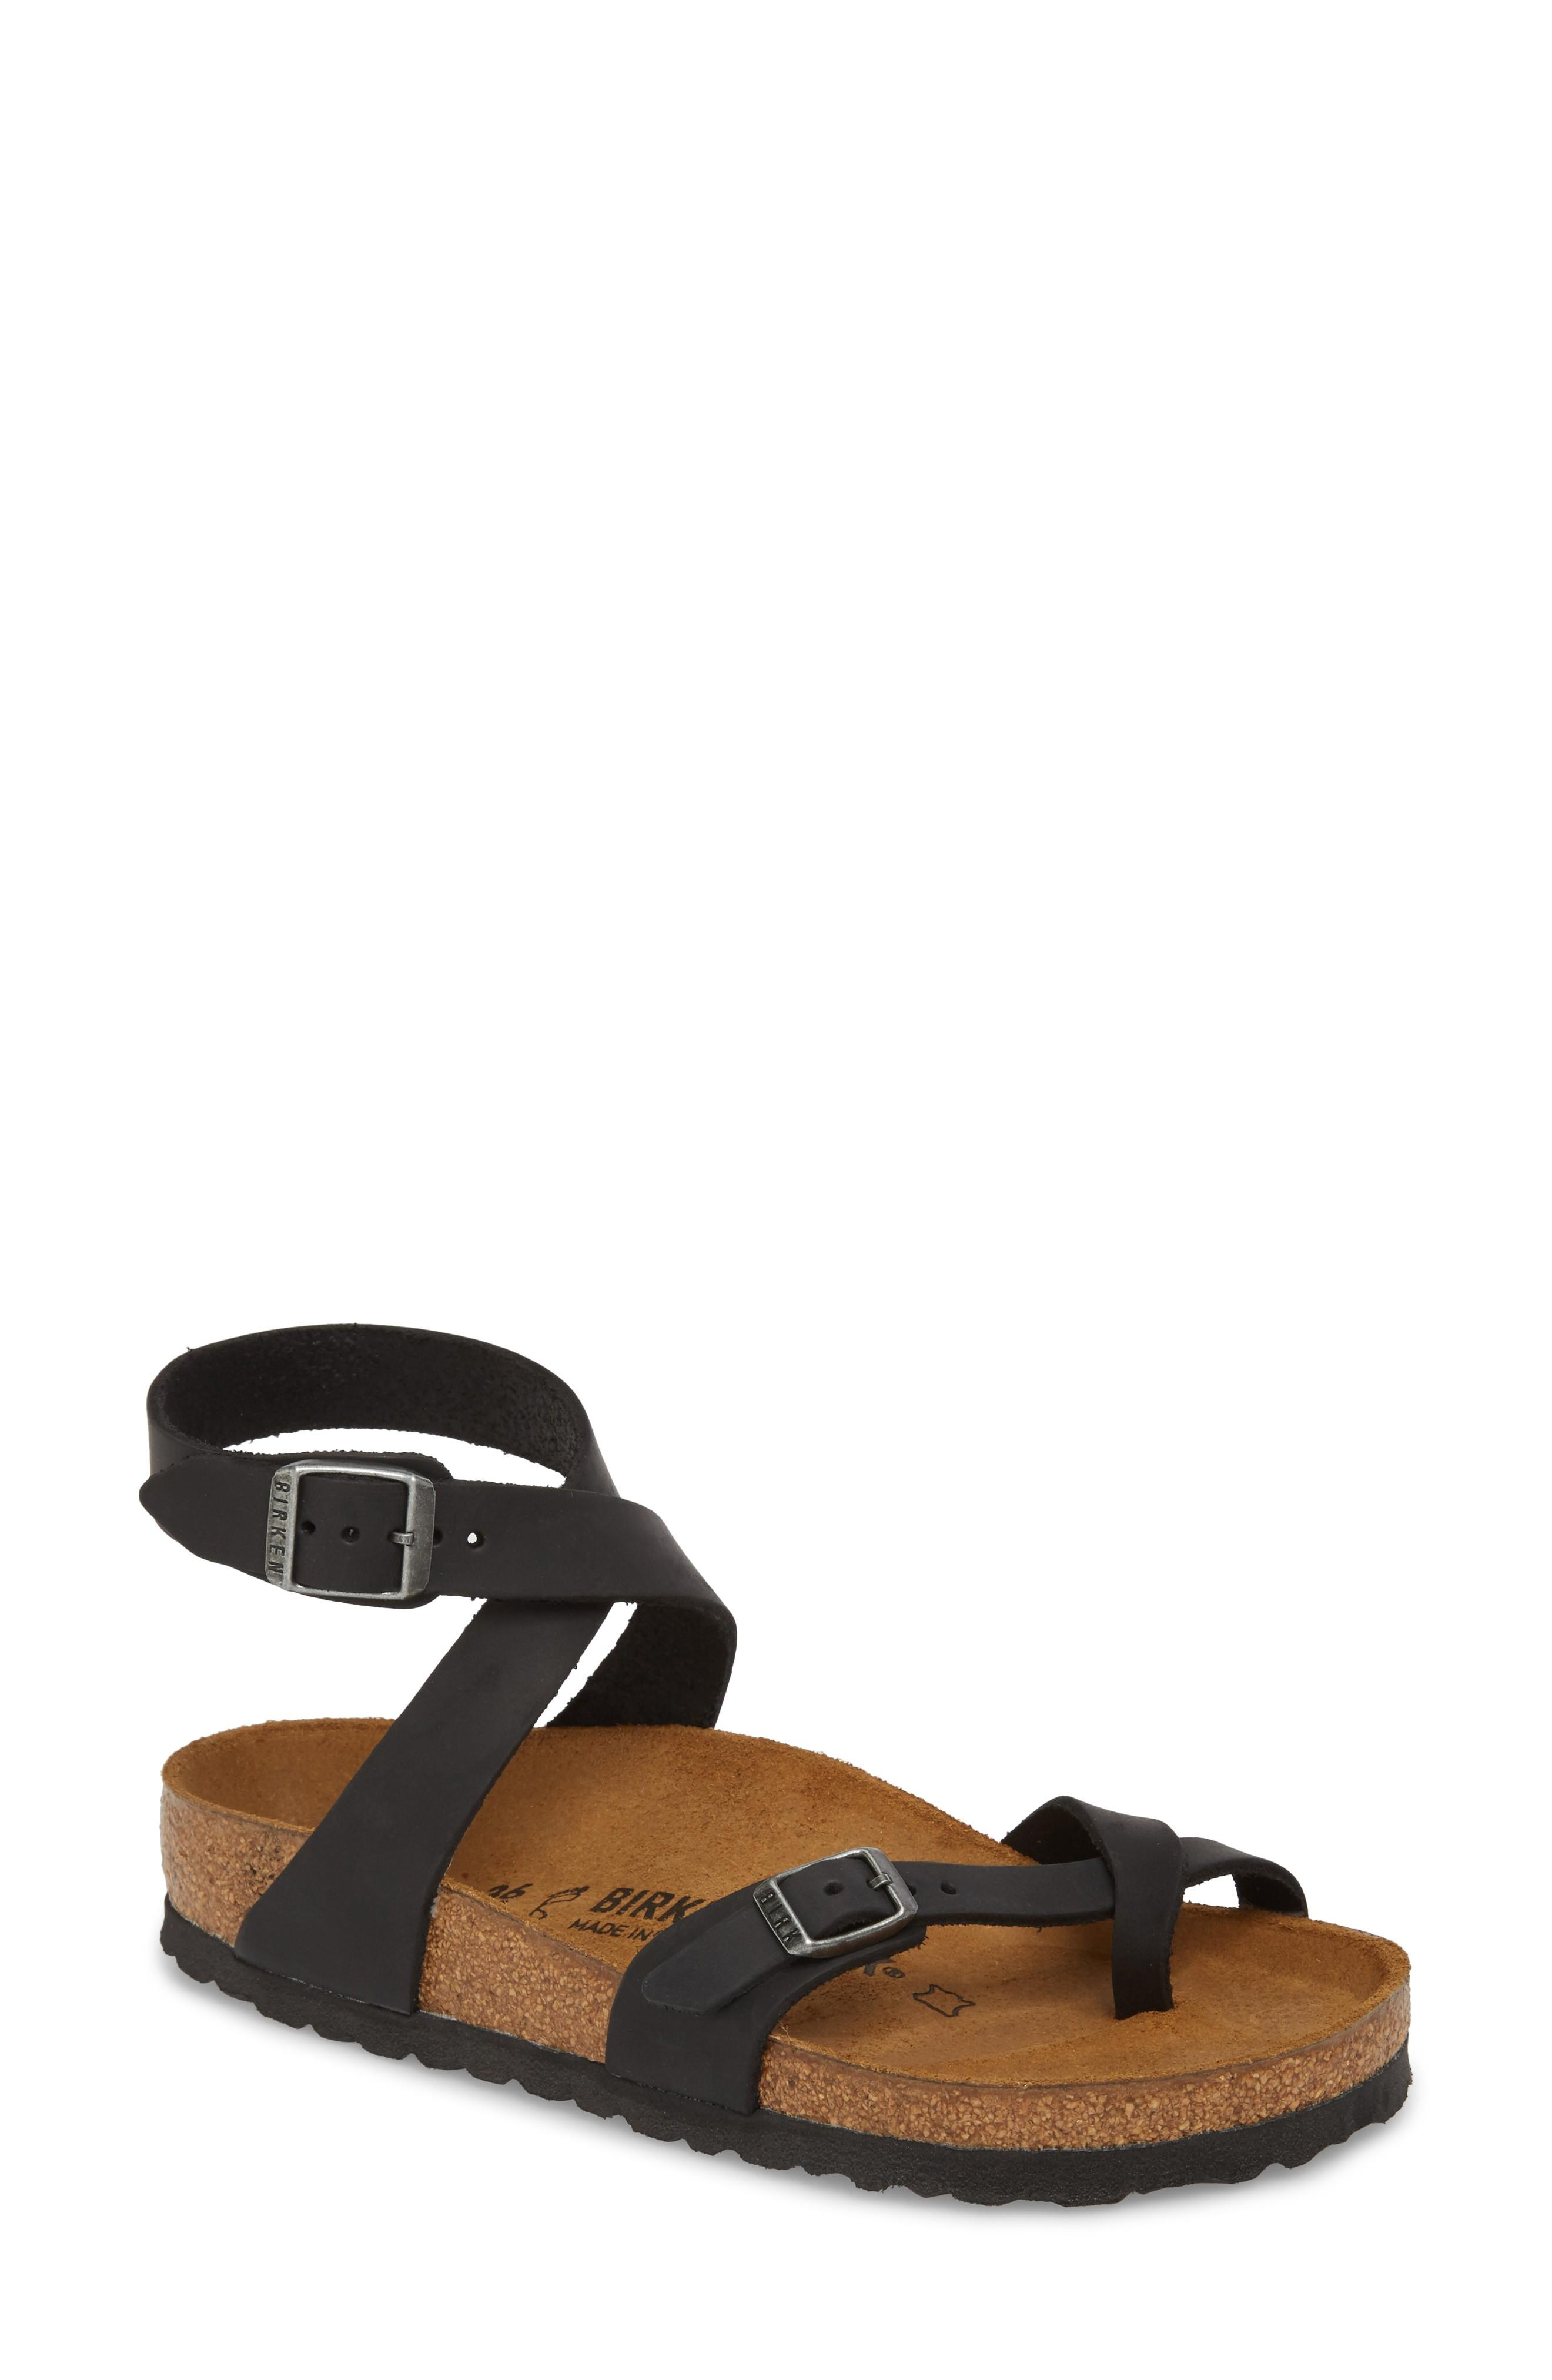 1a065f8836a2 Birkenstock  Yara  Sandal In Black Oiled Leather